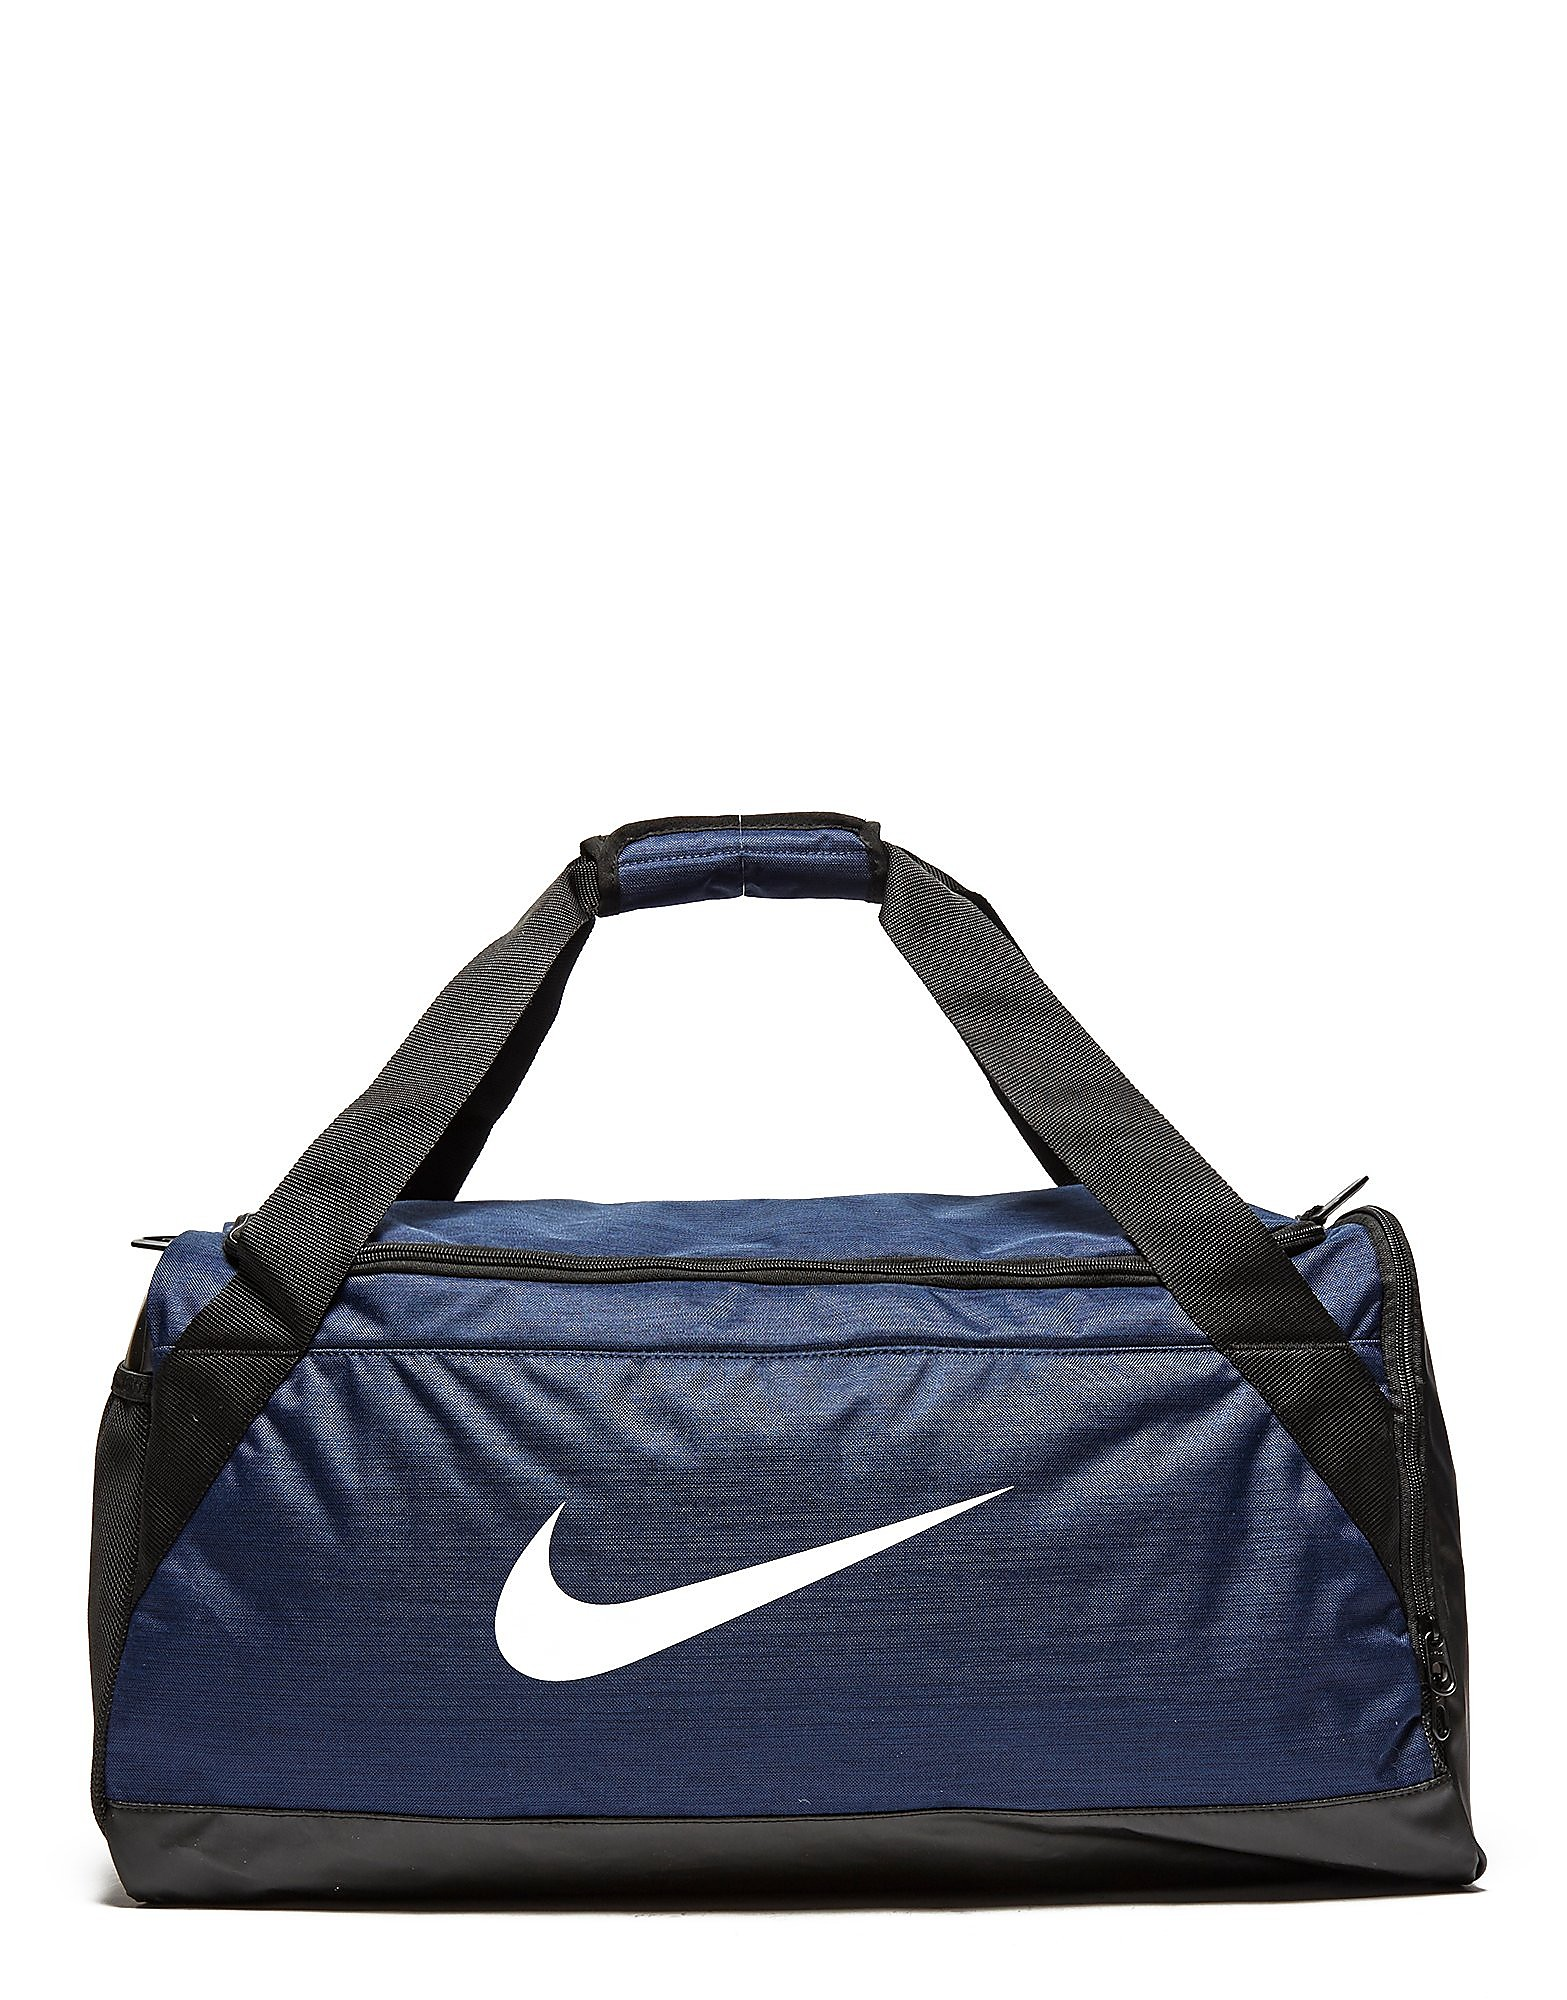 Nike Brasilia Duffel-Bag mittelgroß